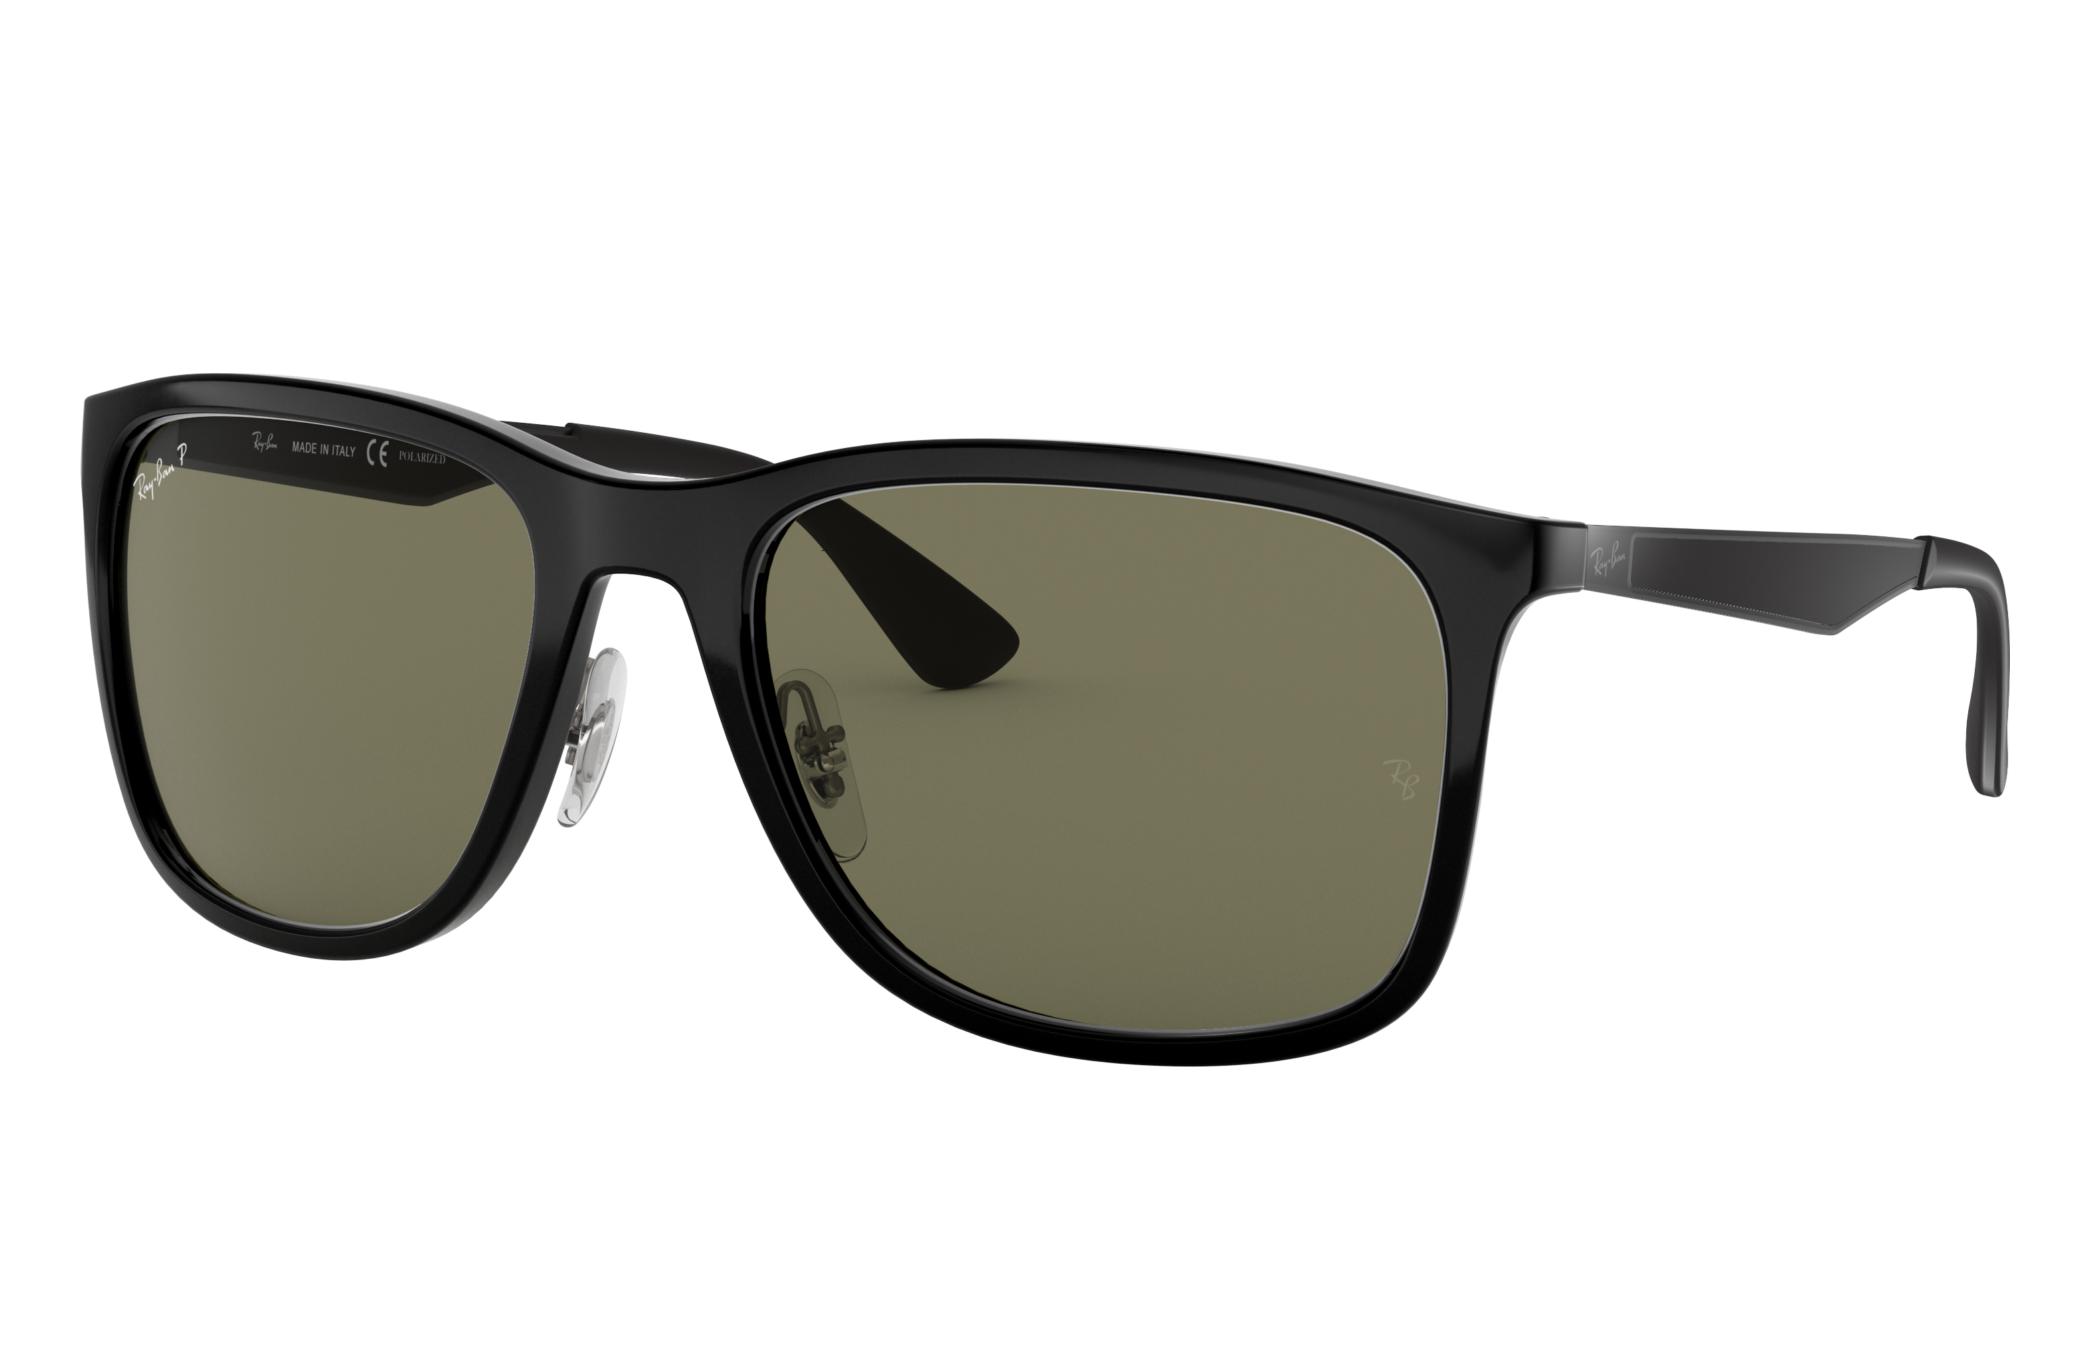 Ray-Ban Rb4313 Gunmetal, Polarized Green Lenses - RB4313